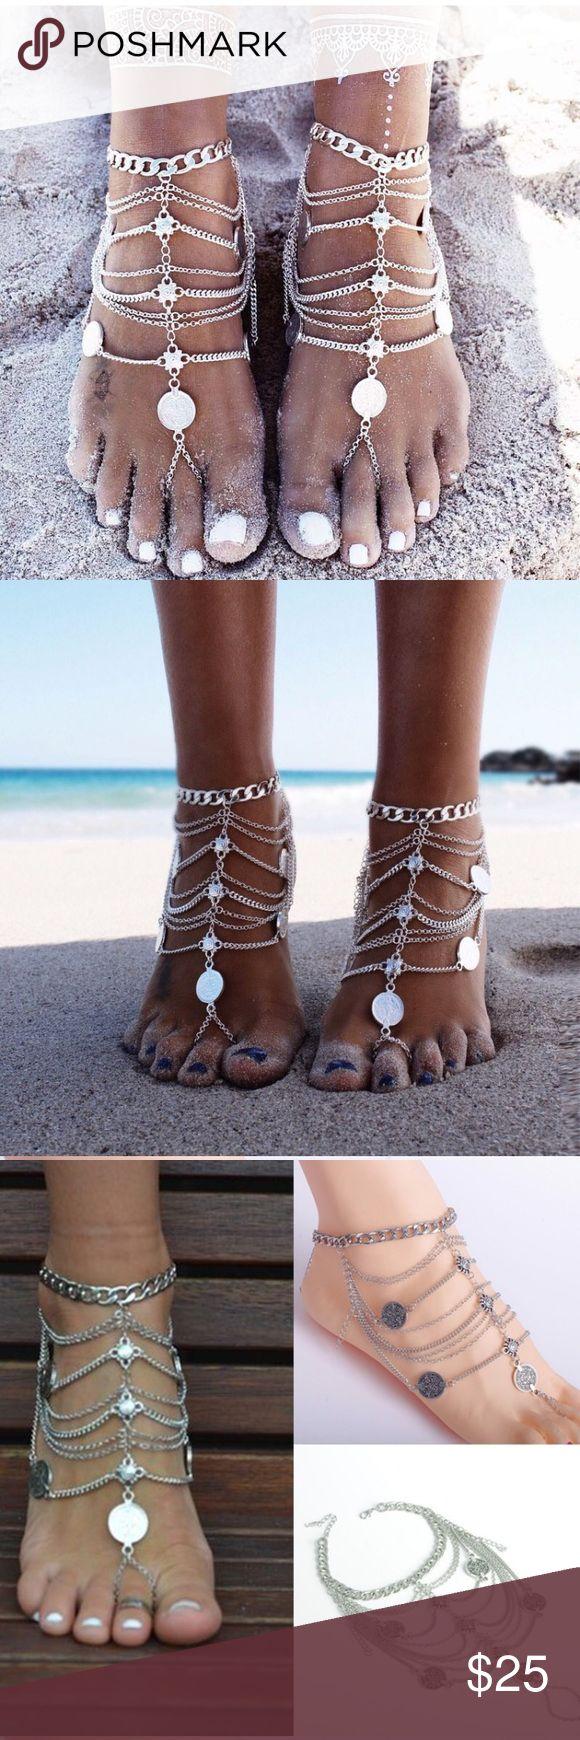 🌟 NEW🌟 Ankle chain foot jewelry silver boho 2017 Sandalia Feminina 2pcs Boho Anklet For Women Leg Bracelet Feet Jewelry Barefoot Sandals Retro Ankle Chain Foot Jewellery Jewelry